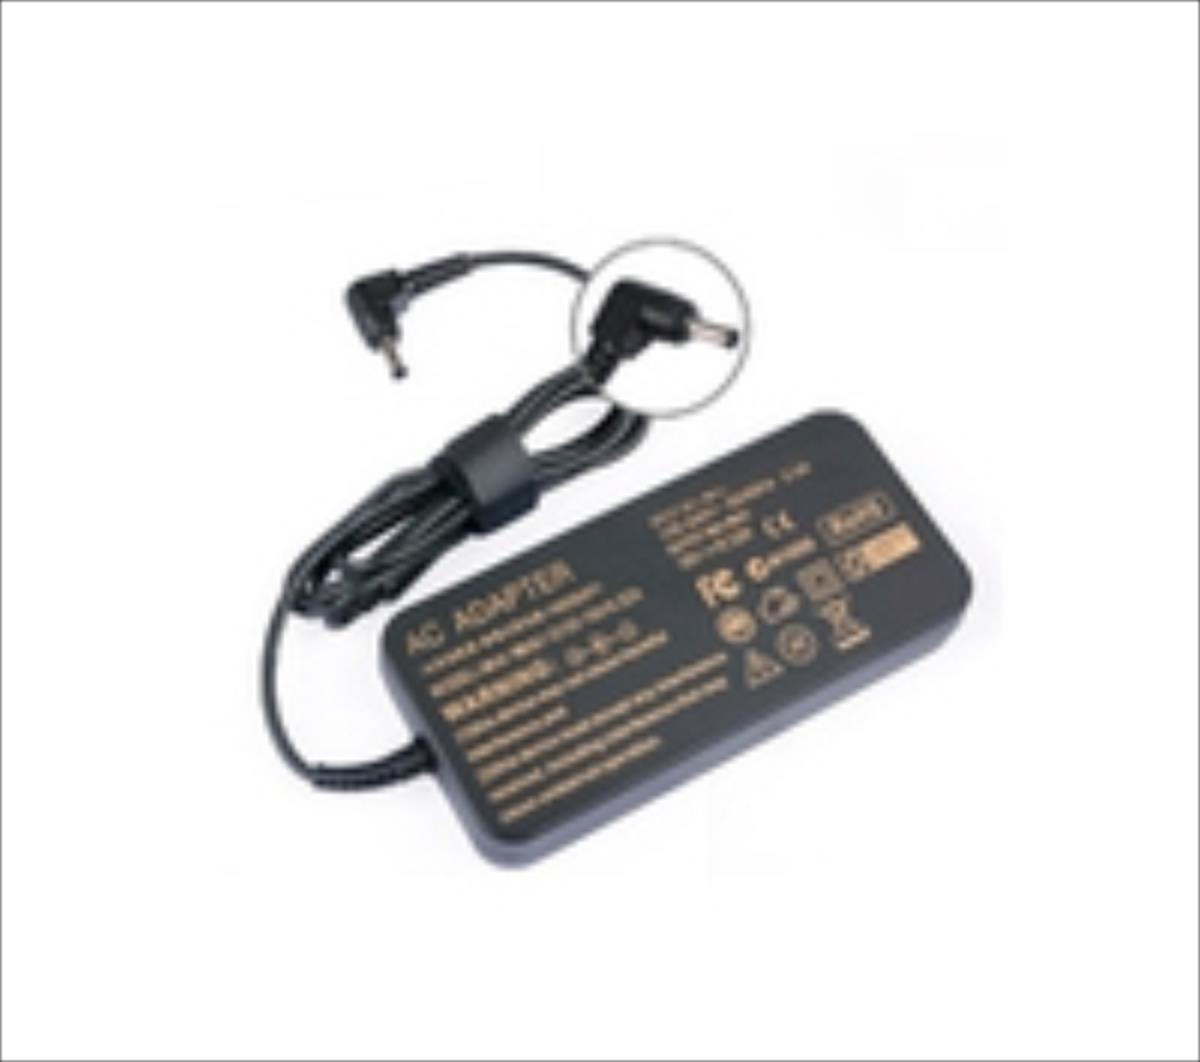 MicroBattery 120W Asus Power Adapter 19V 6.32A Plug: 5.52.5 ADP-120ZB BB, 90-N8BPW3000T, 90-N00PW6400T, PA-1121-28 MBXAS-AC0004 portatīvo datoru lādētājs